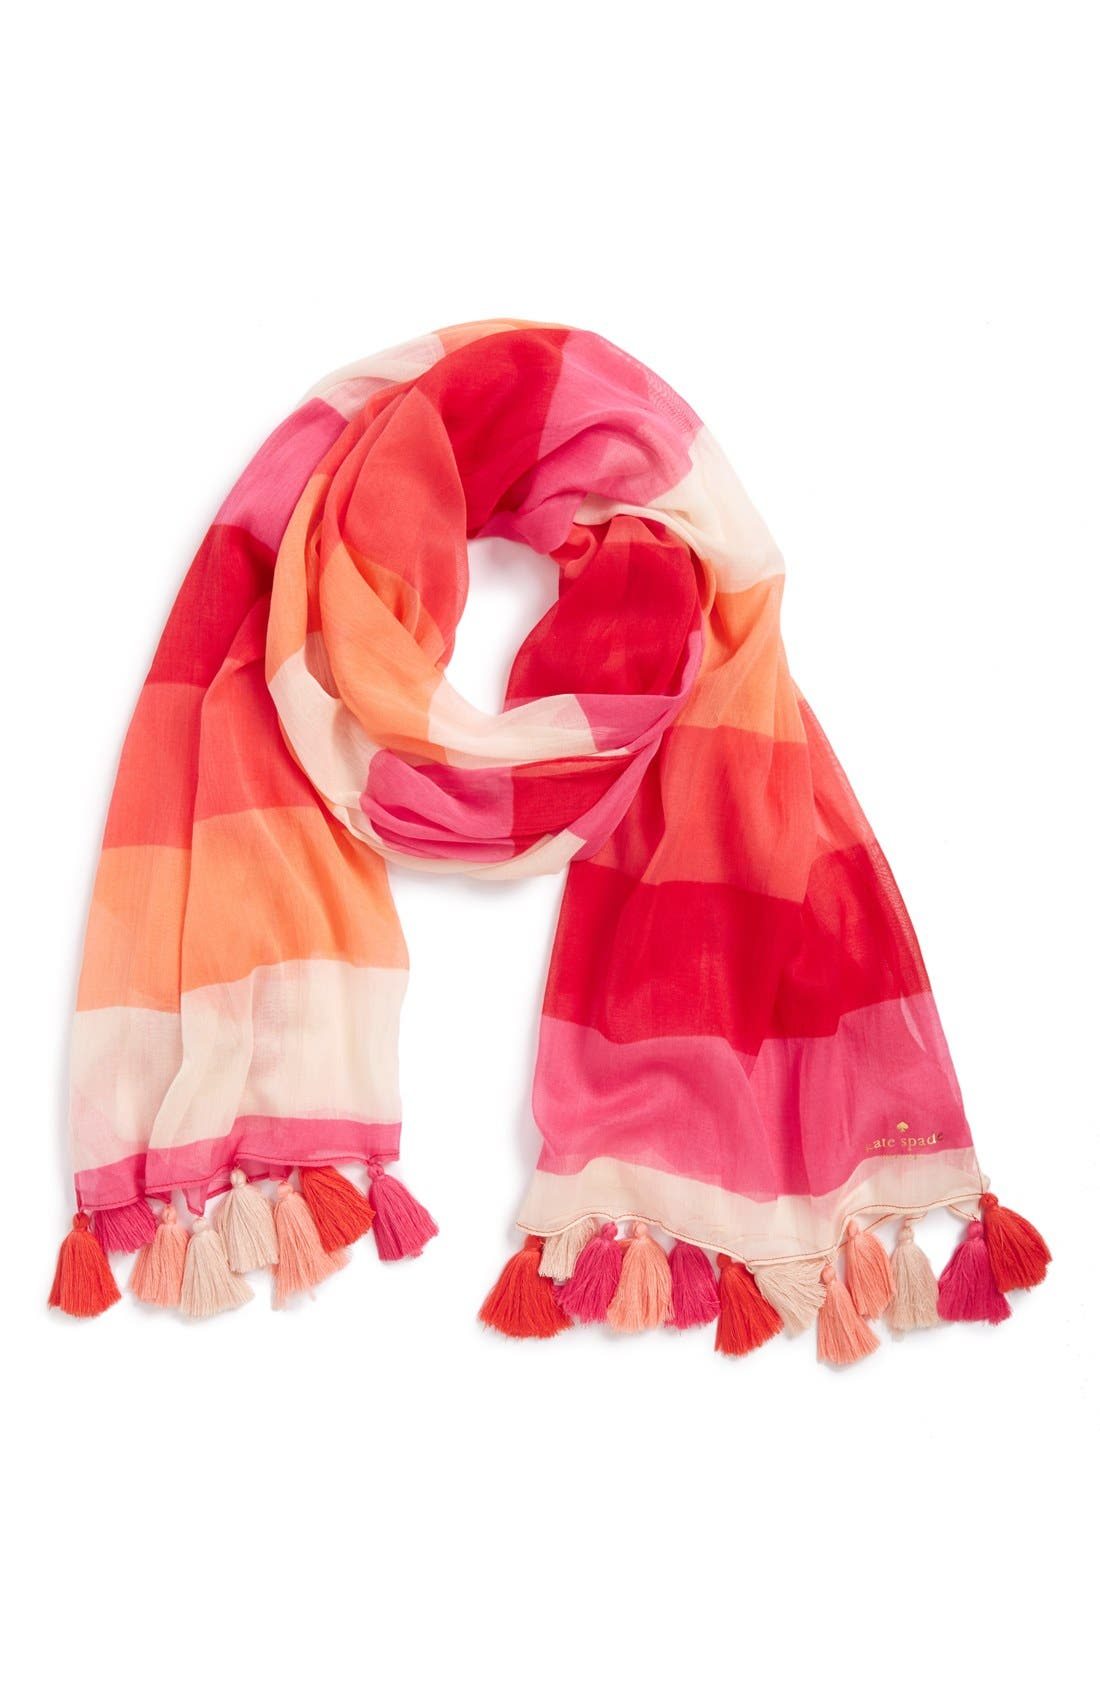 Main Image - kate spade new york 'ombré pom' colorblock scarf